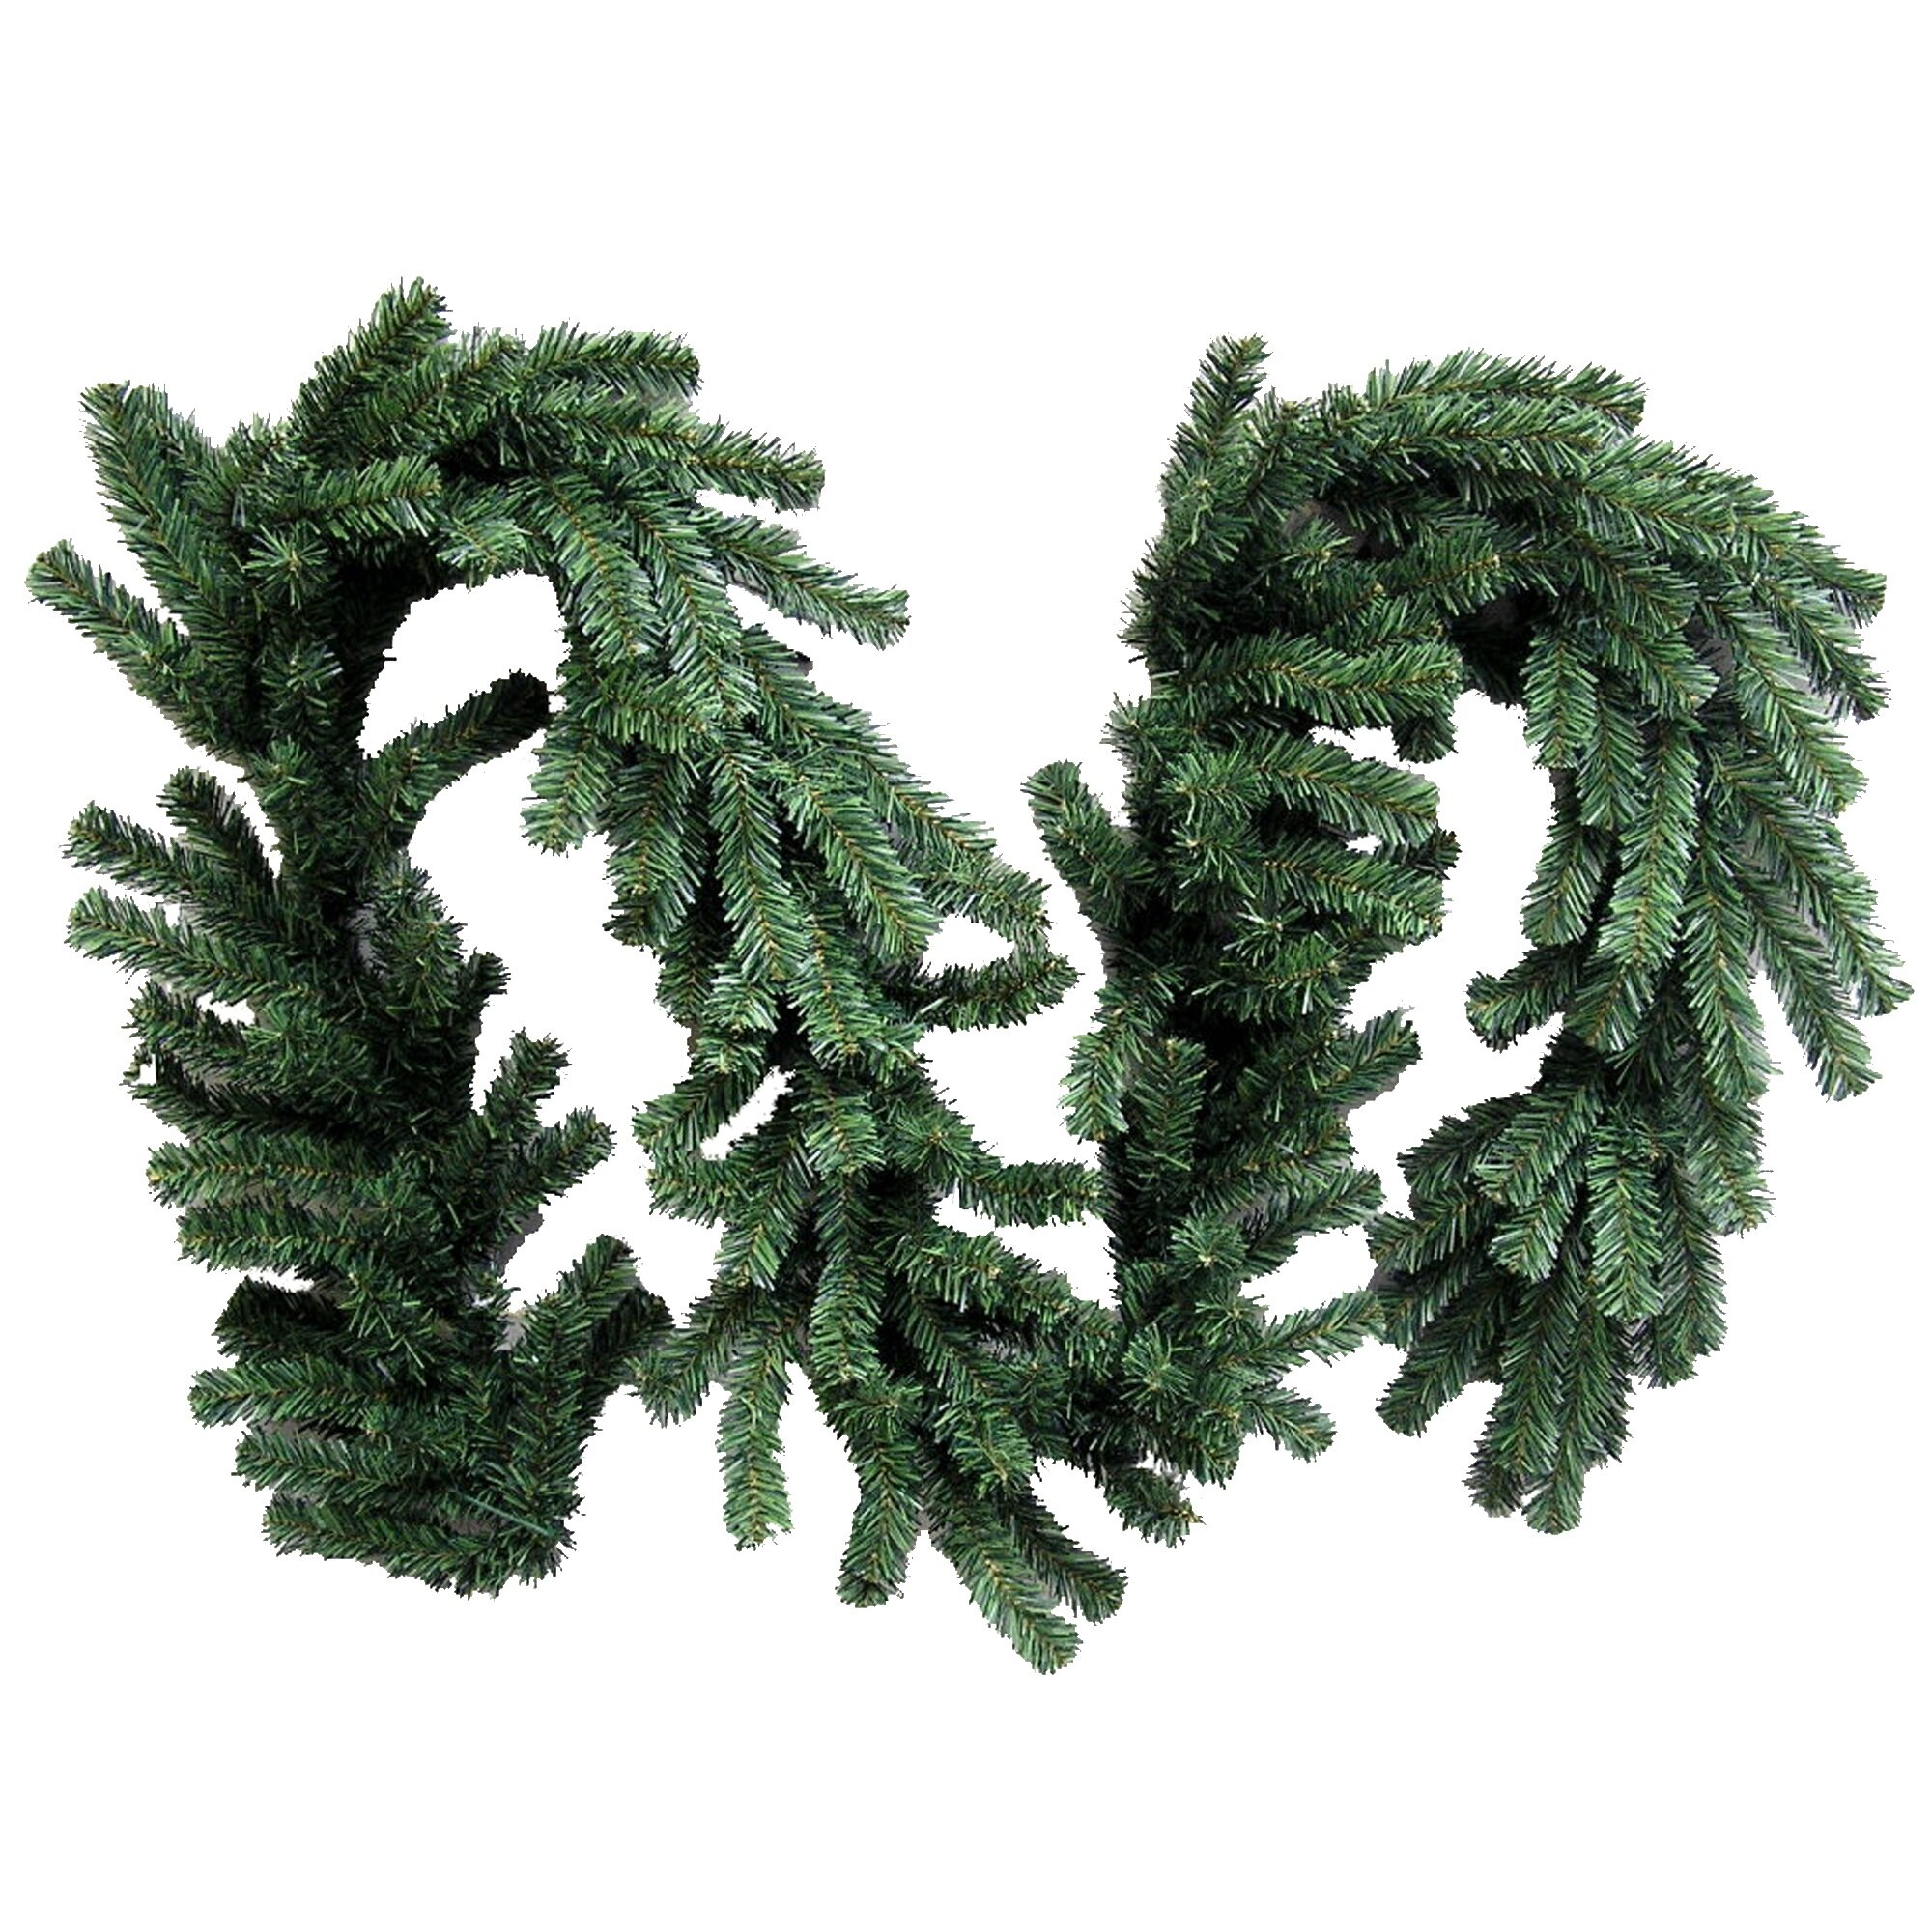 Christmas Pine Garland.9 Canadian Christmas Pine Garland